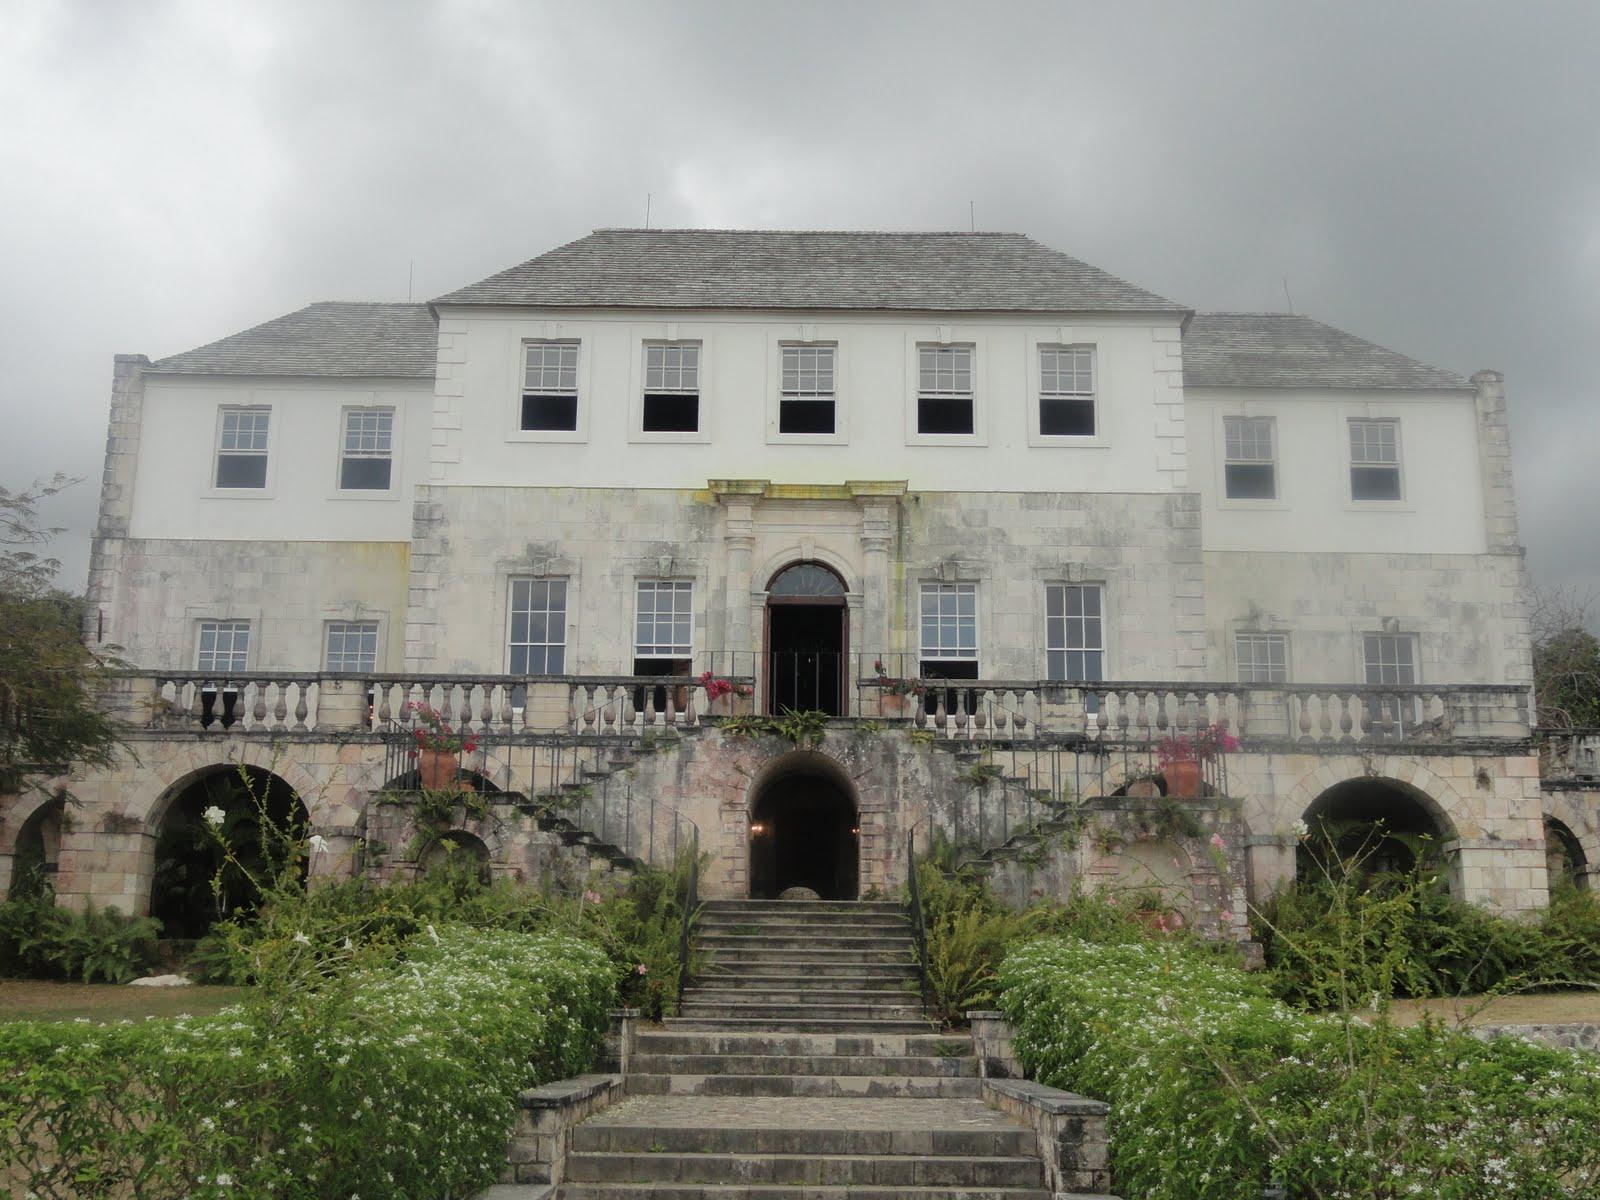 bruja blanca rose hall jamaica 25